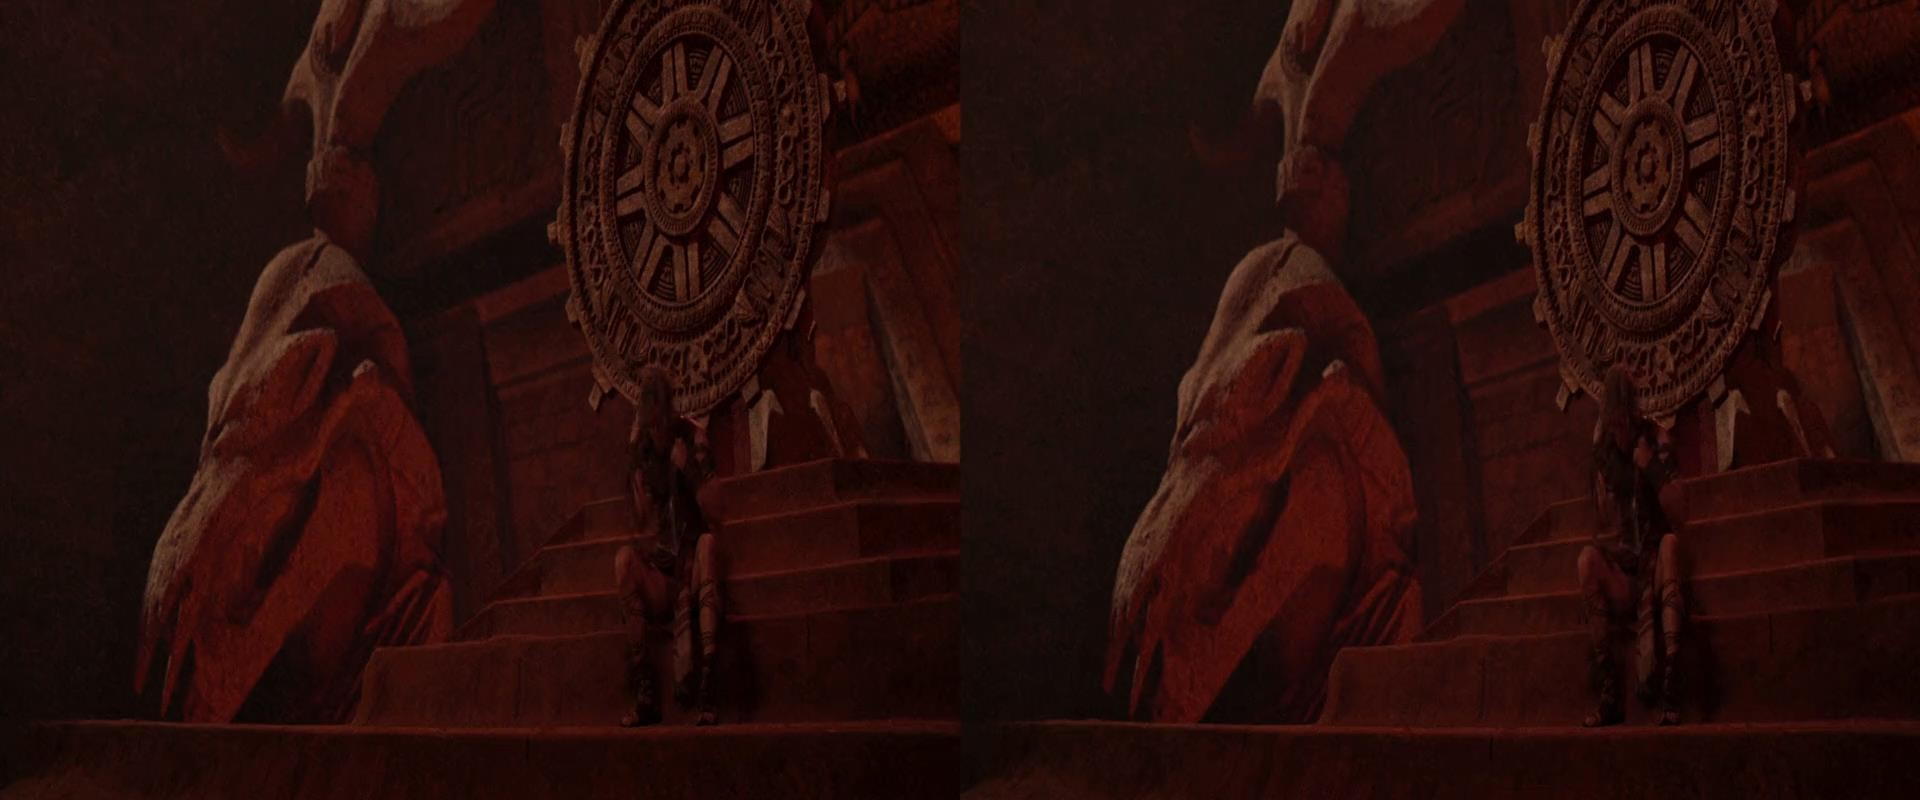 Mısır Tanrıları - Gods of Egypt | 2016 | 3D HALF-SBS BluRay 1080p | DUAL TR-EN